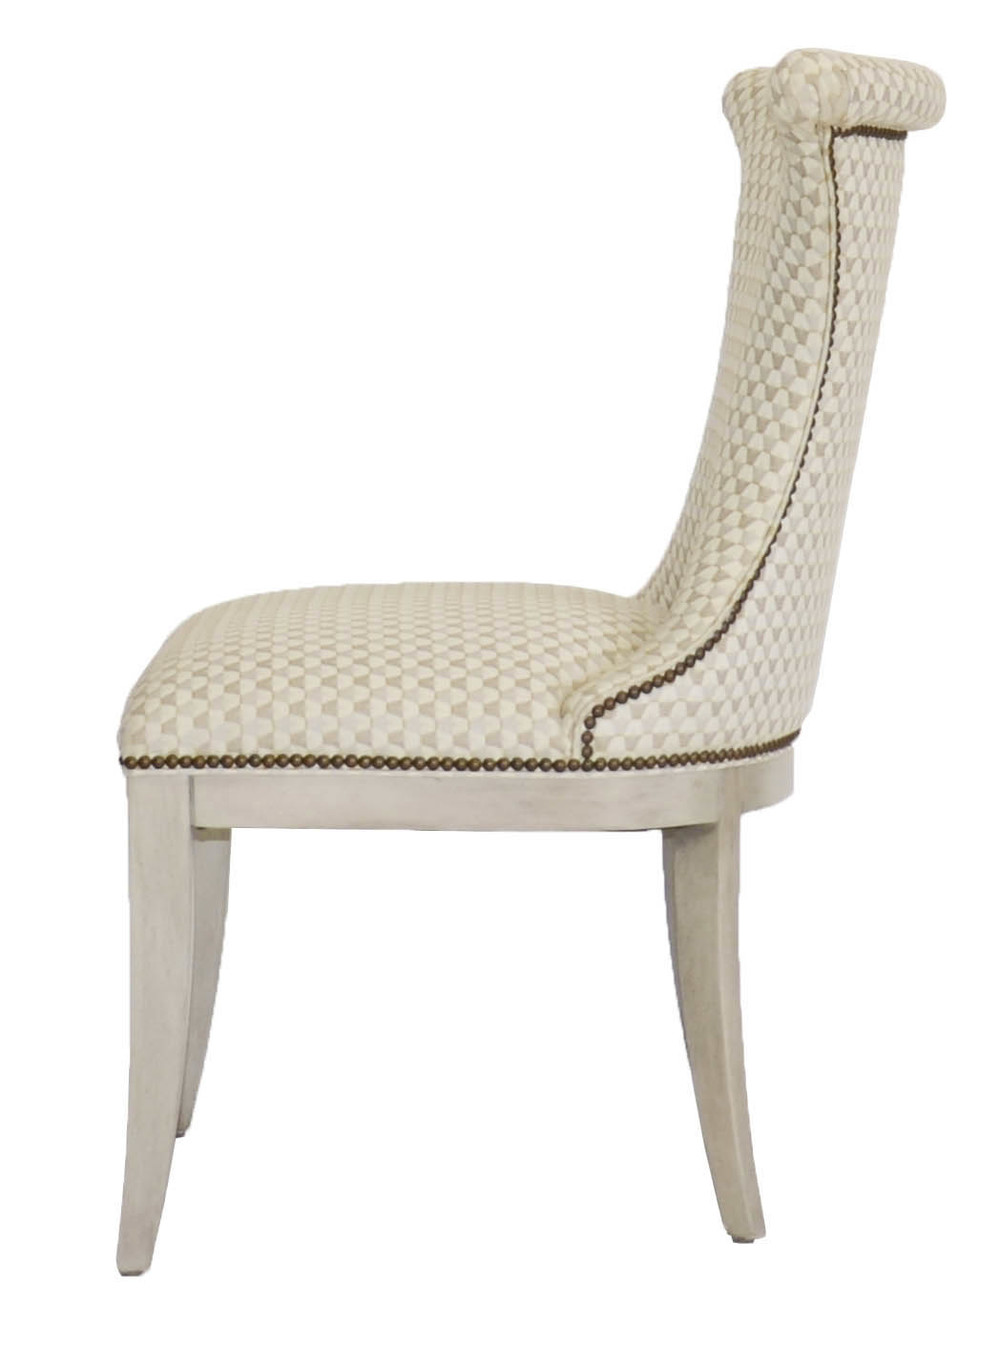 Vanguard Furniture - Eve Side Chair